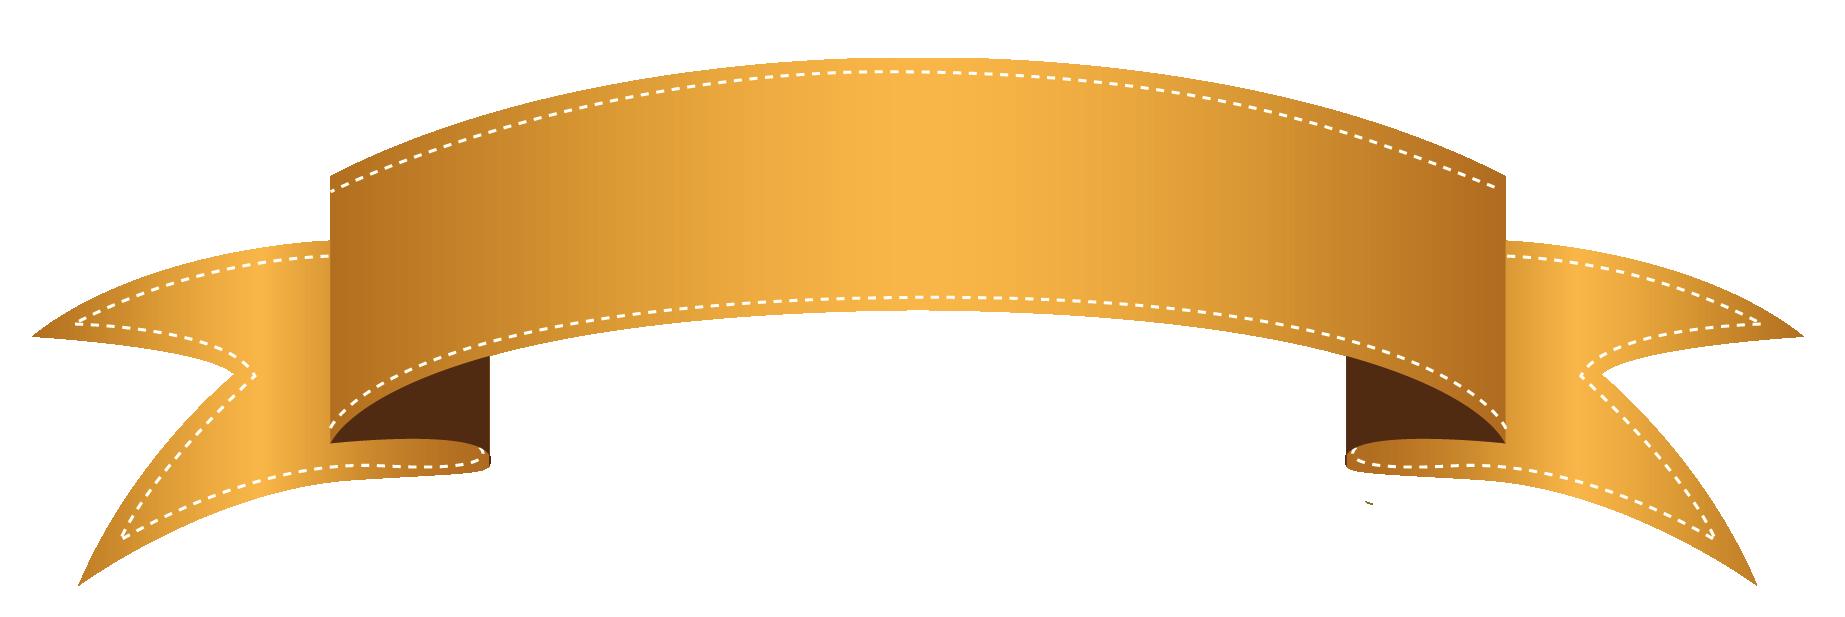 1845x617 Orange Transparent Banner Png Clipartu200b Gallery Yopriceville